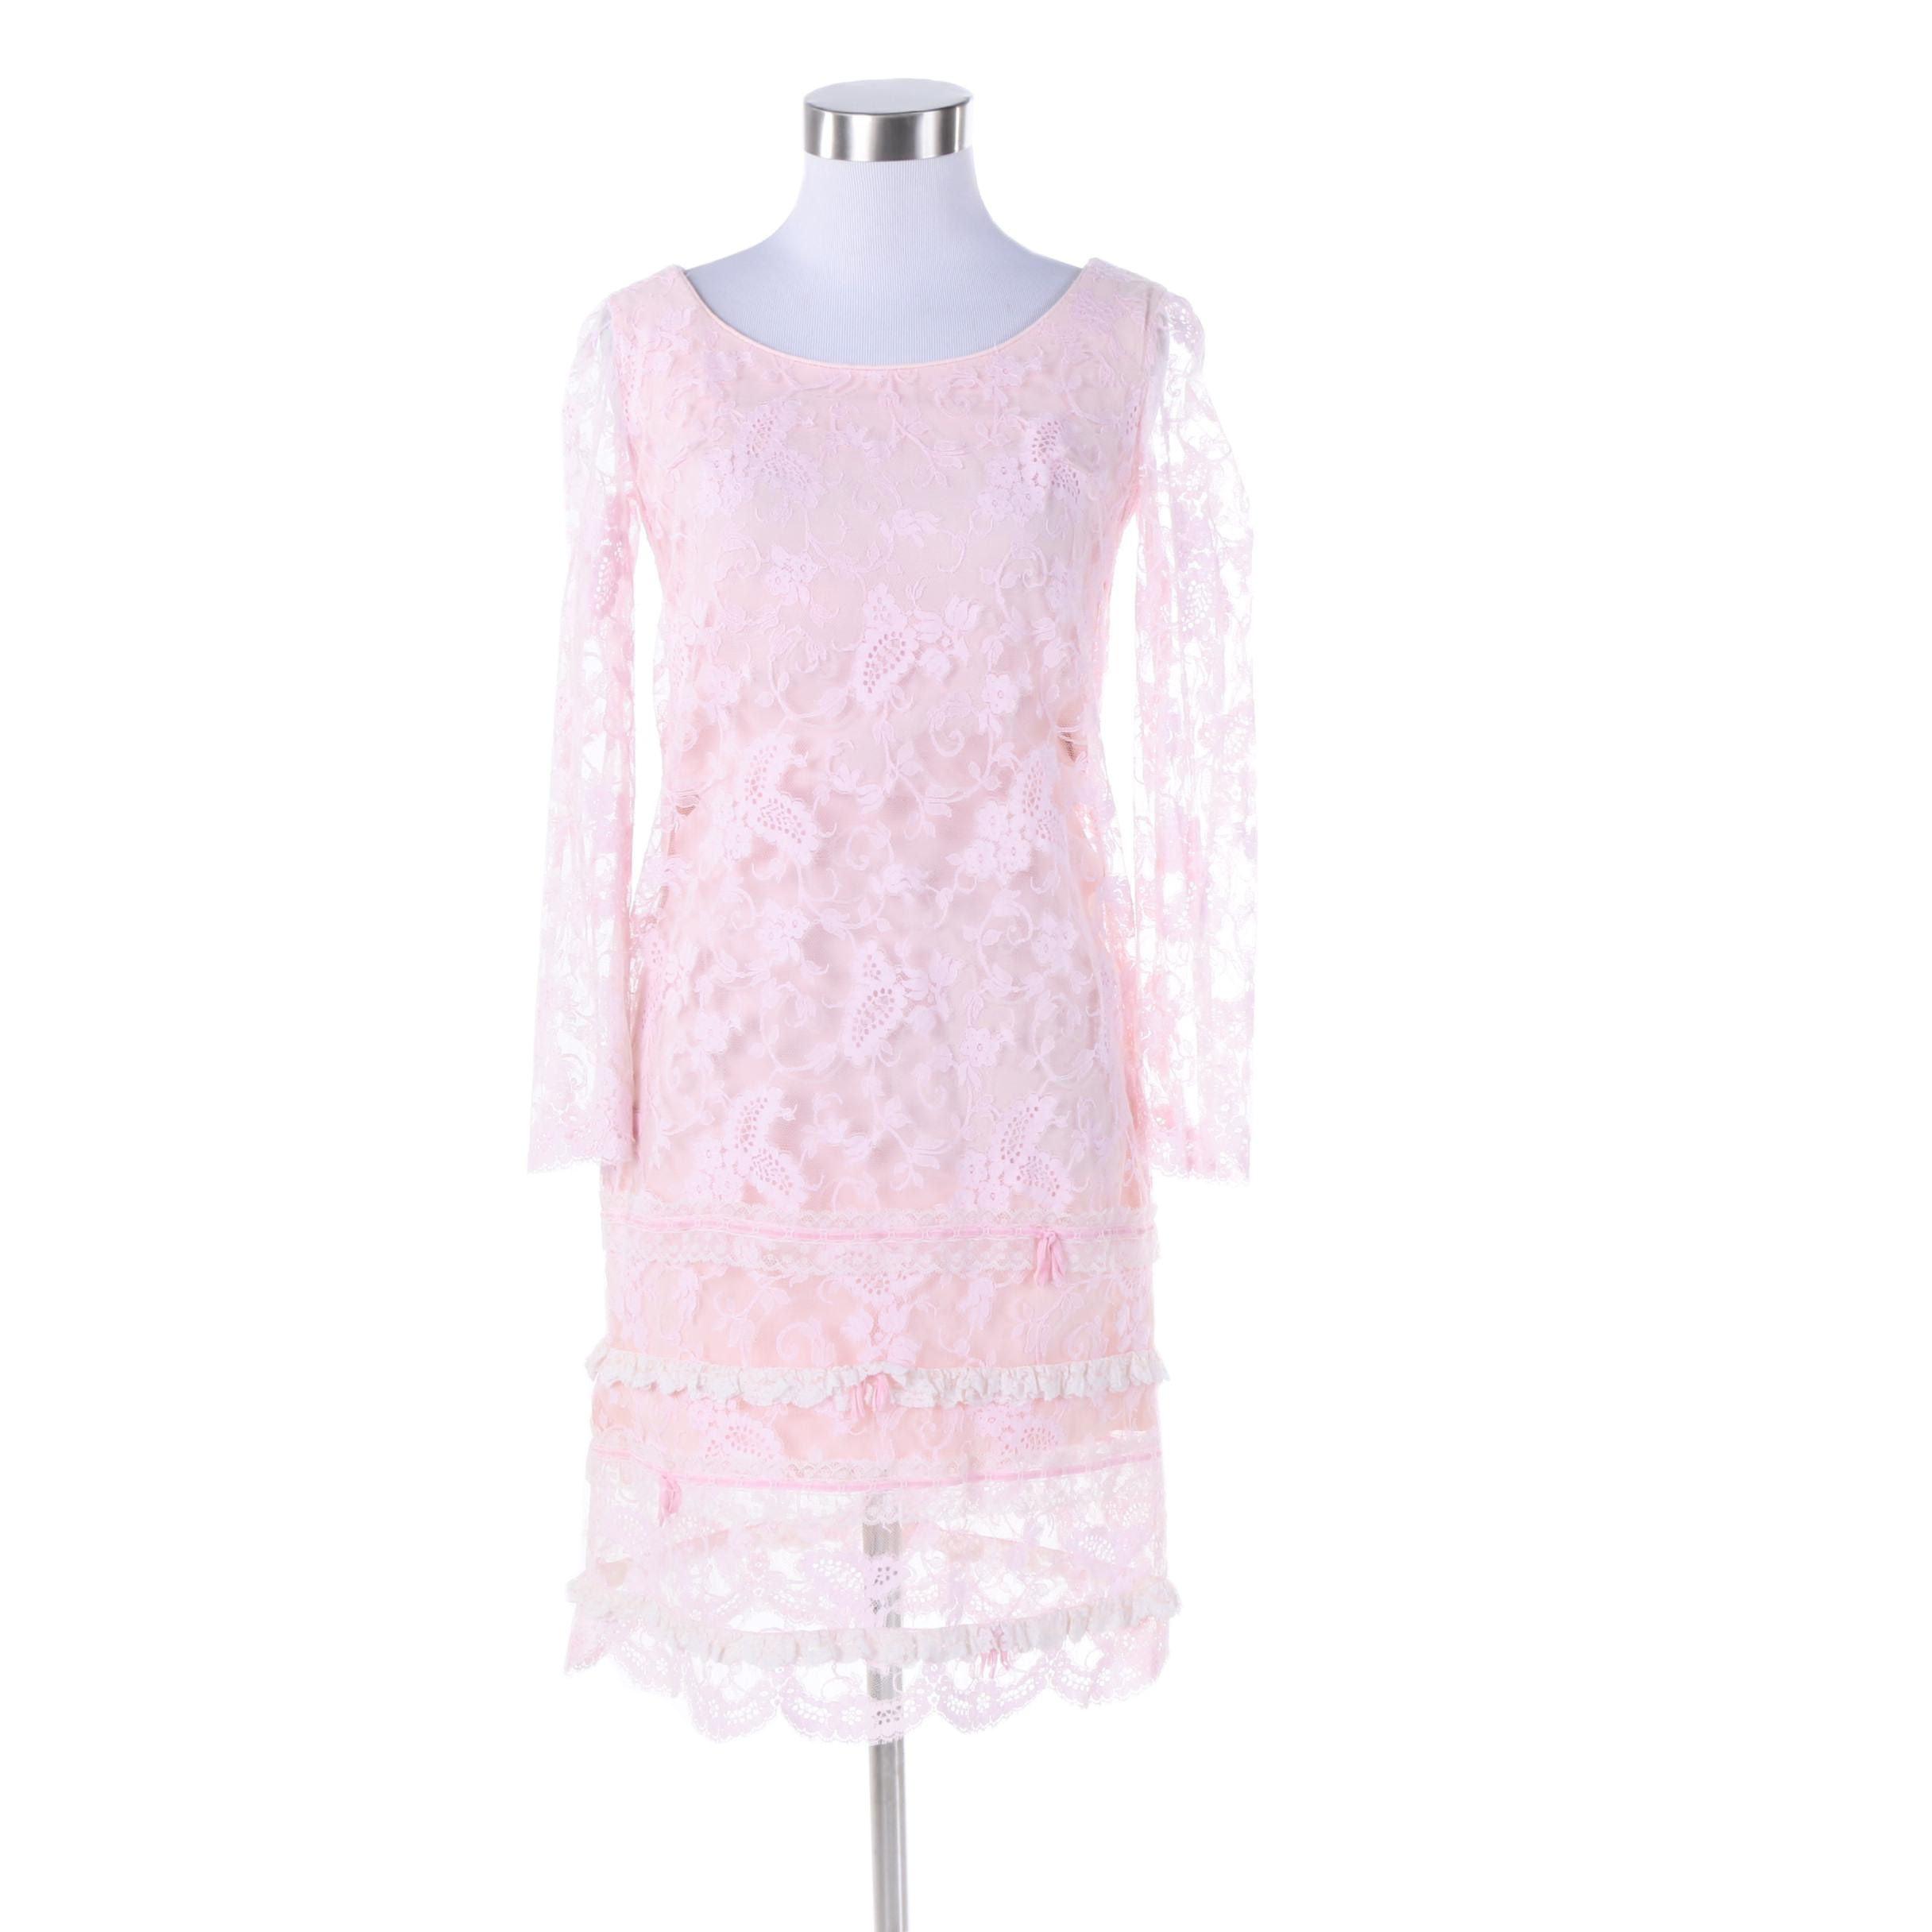 1970s Geoffrey Beene Boutique Pink Lace Mod Dress